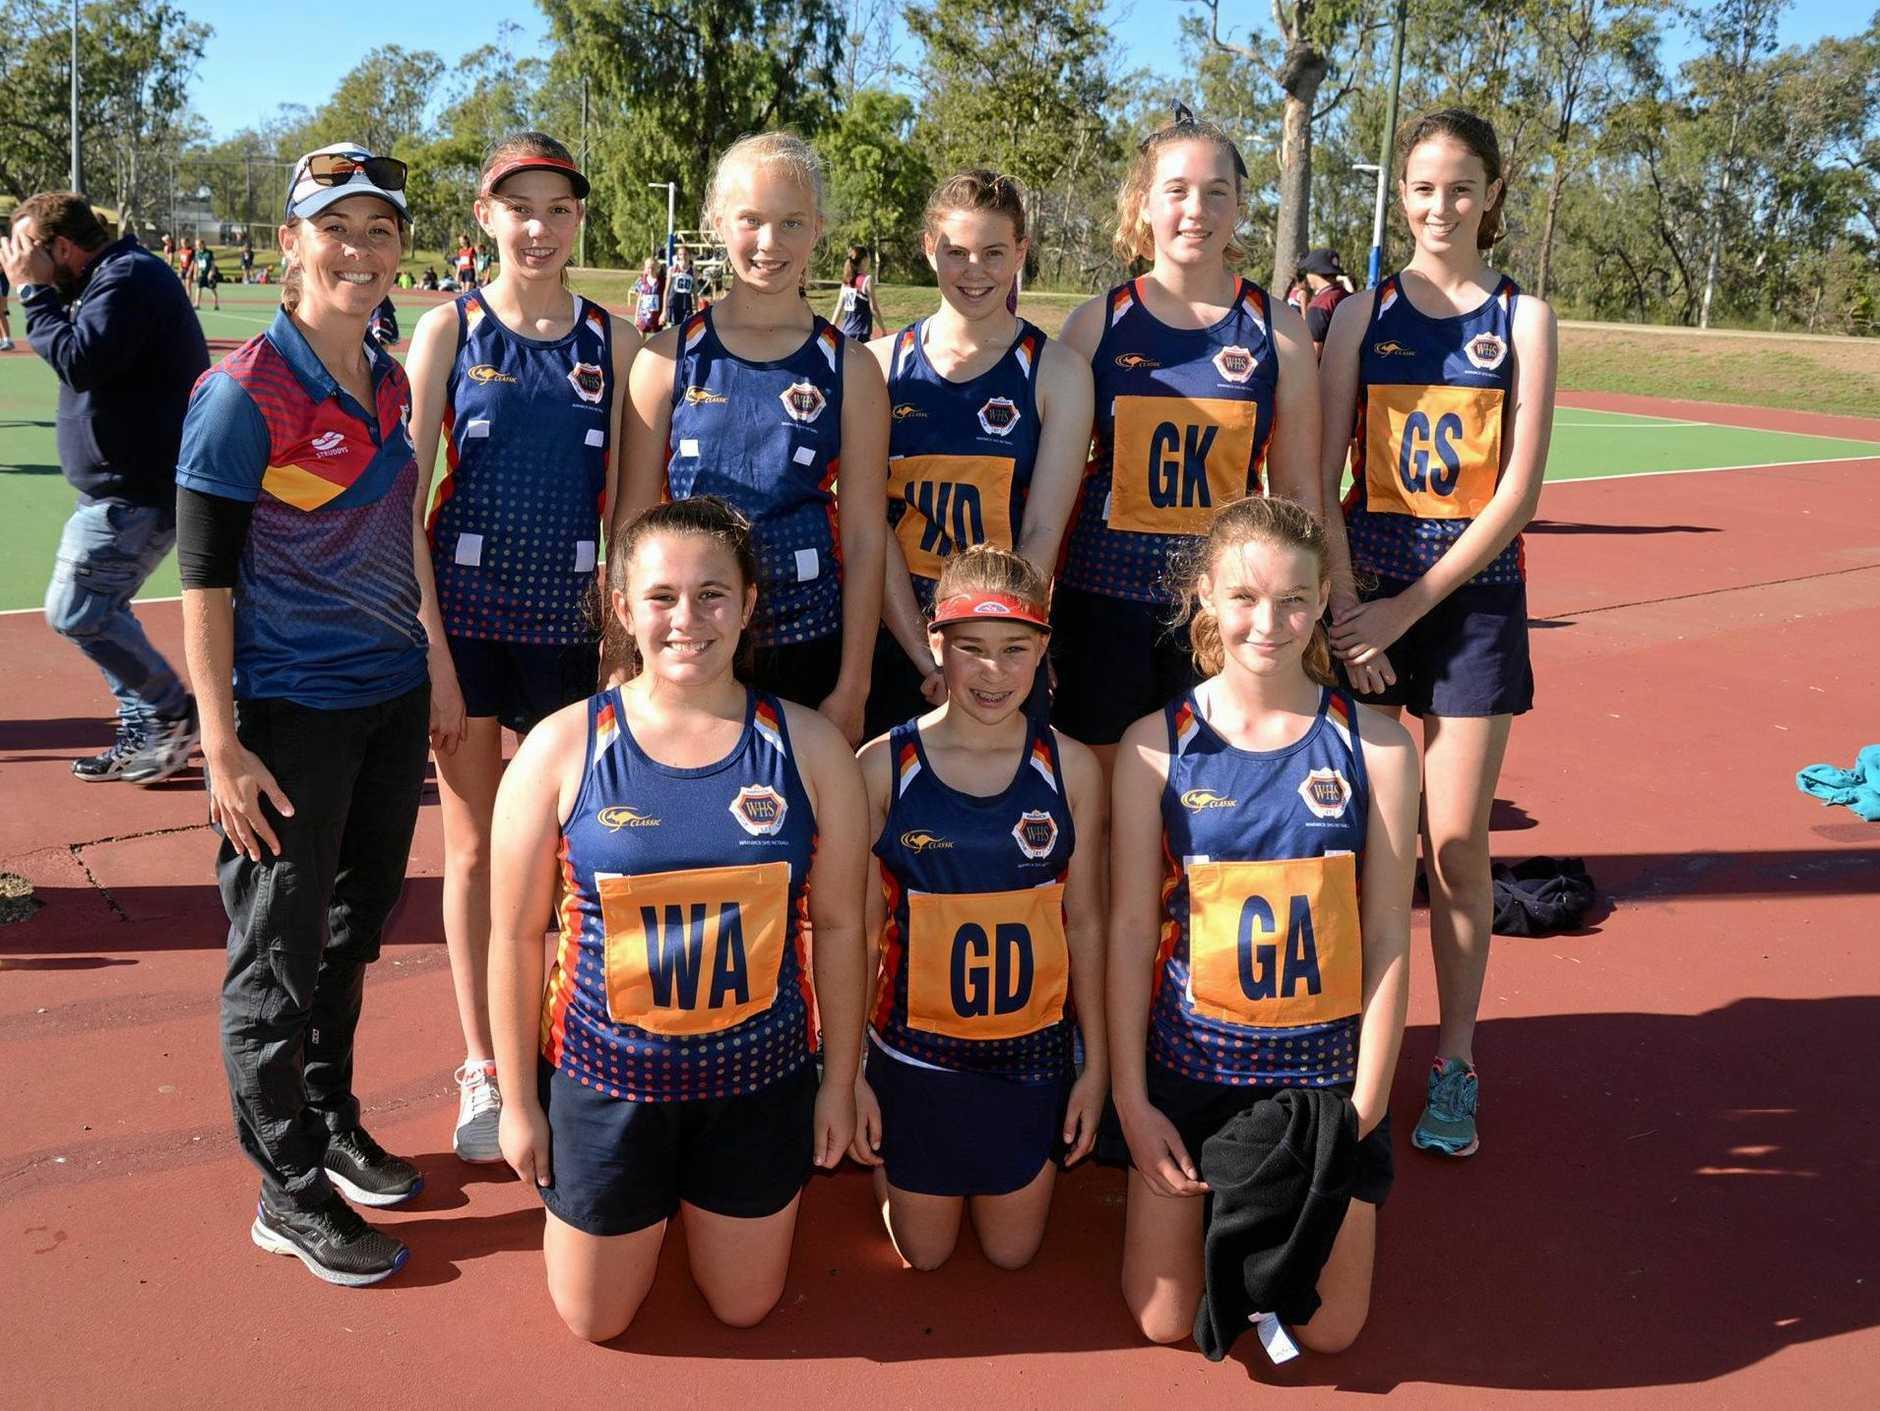 Warwick State High School netball team (back, from left) coach Michelle Byrne, Sophie Strom, Shakira Saunders, Briony Walker, Alyssa Welsh, Sophie Kuhn, (front) Learna Moncada, Aliza Schelbach and Nicolene Snyman.